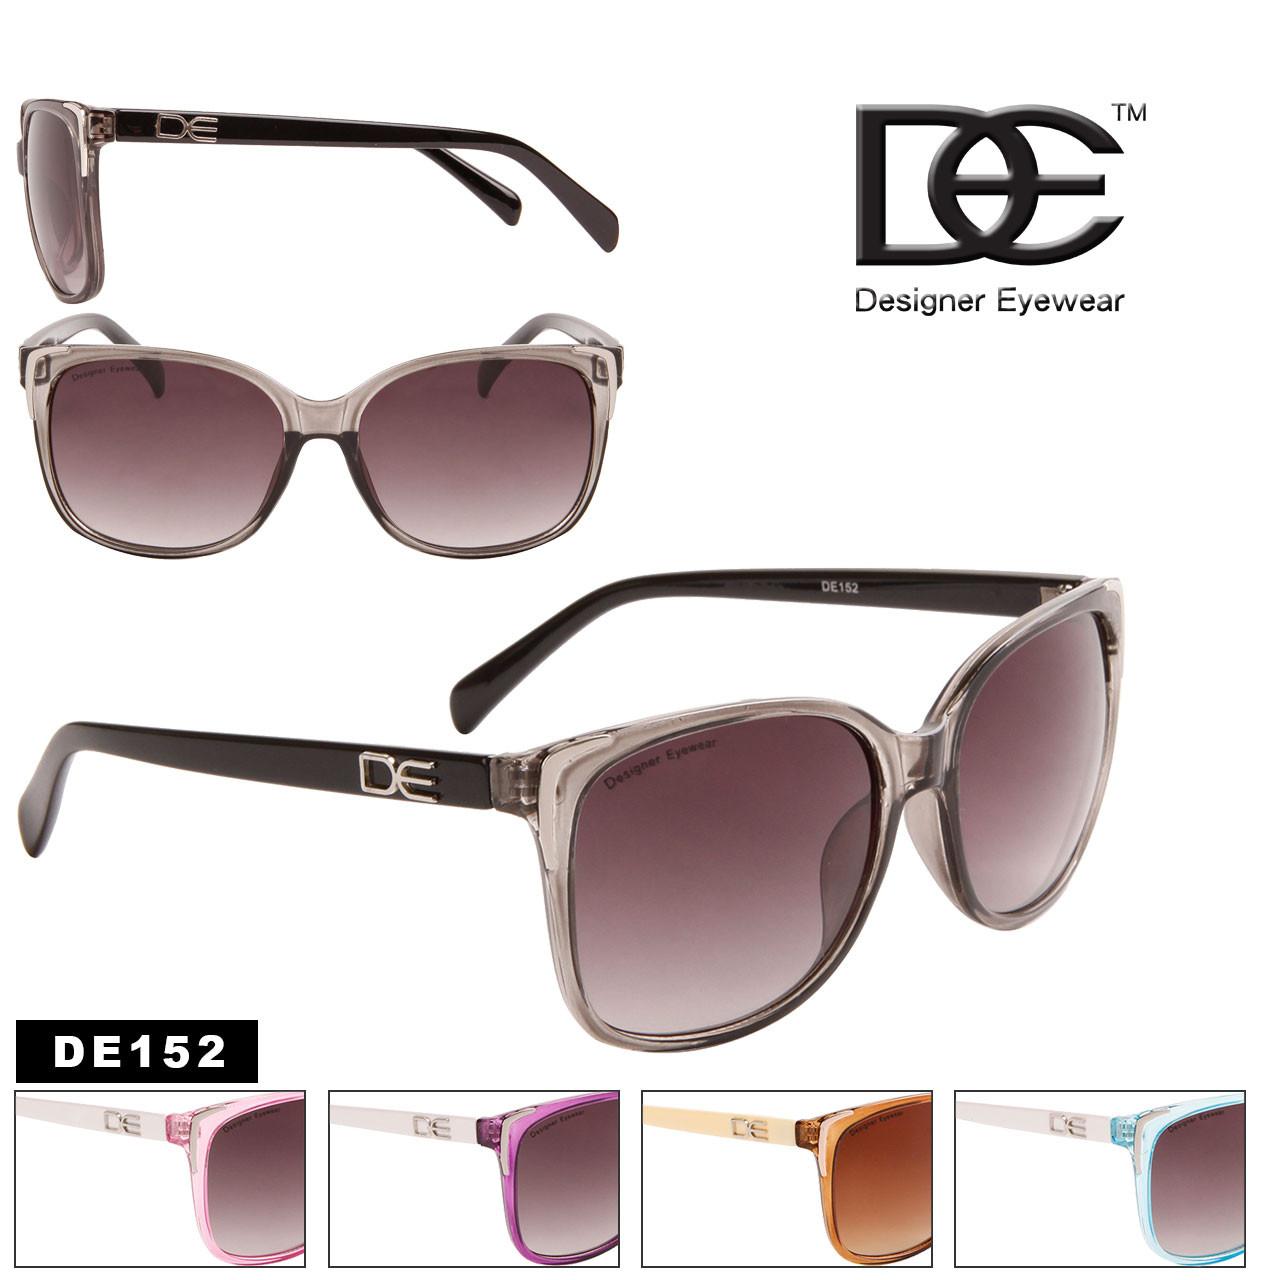 DE™ Designer Eyewear Wholesale Sunglasses - Style #DE152